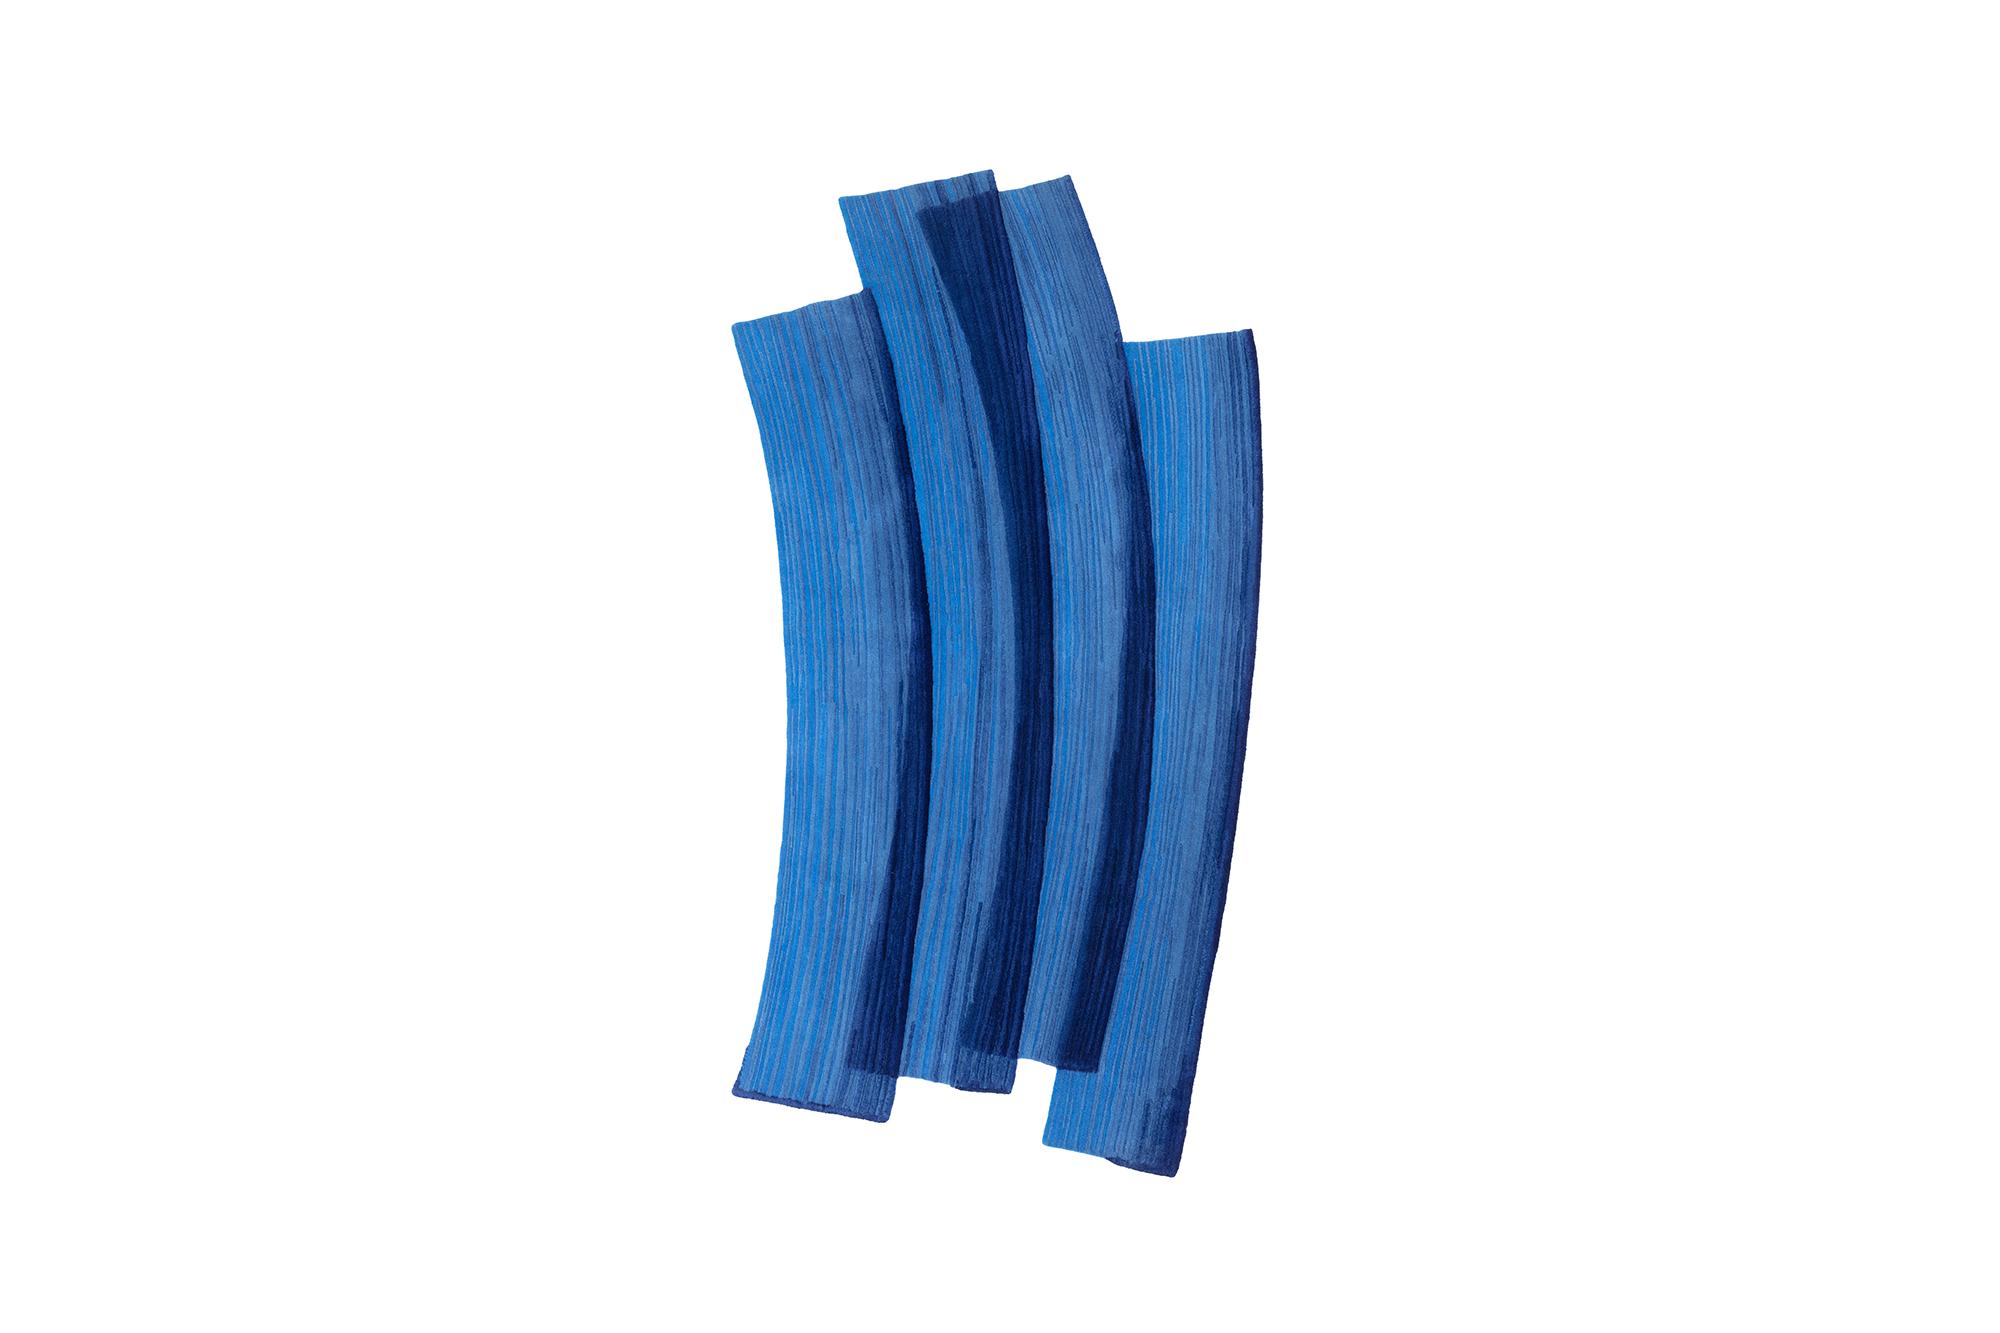 Stroke 1.0 Blue Rug